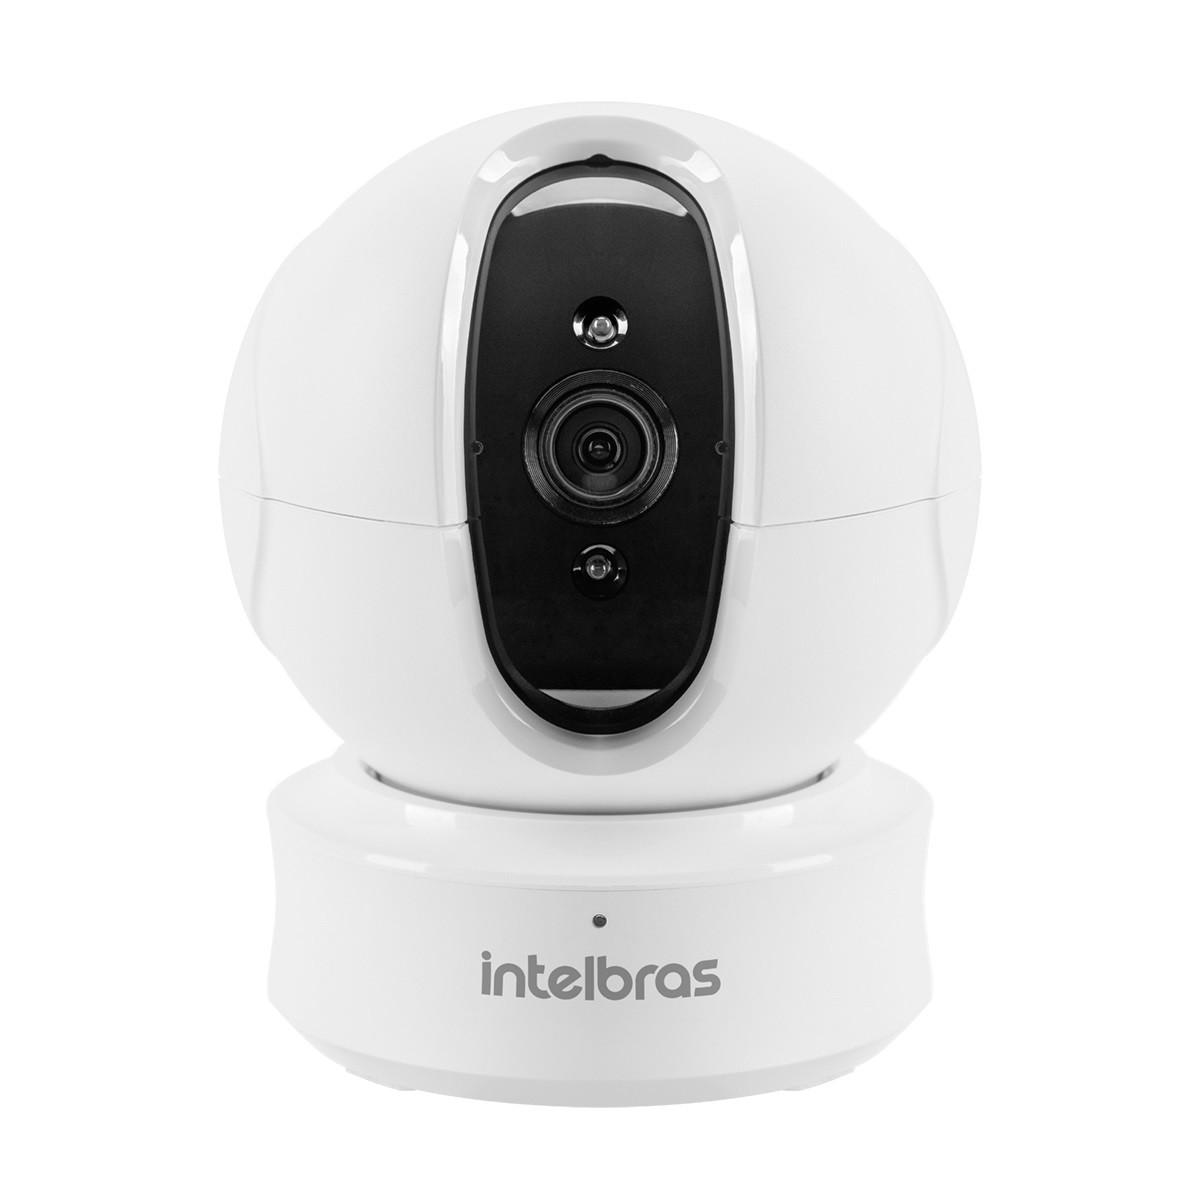 Camera Seguranca sem Fio WI-FI HD Branco - Ic4 - Intelbras